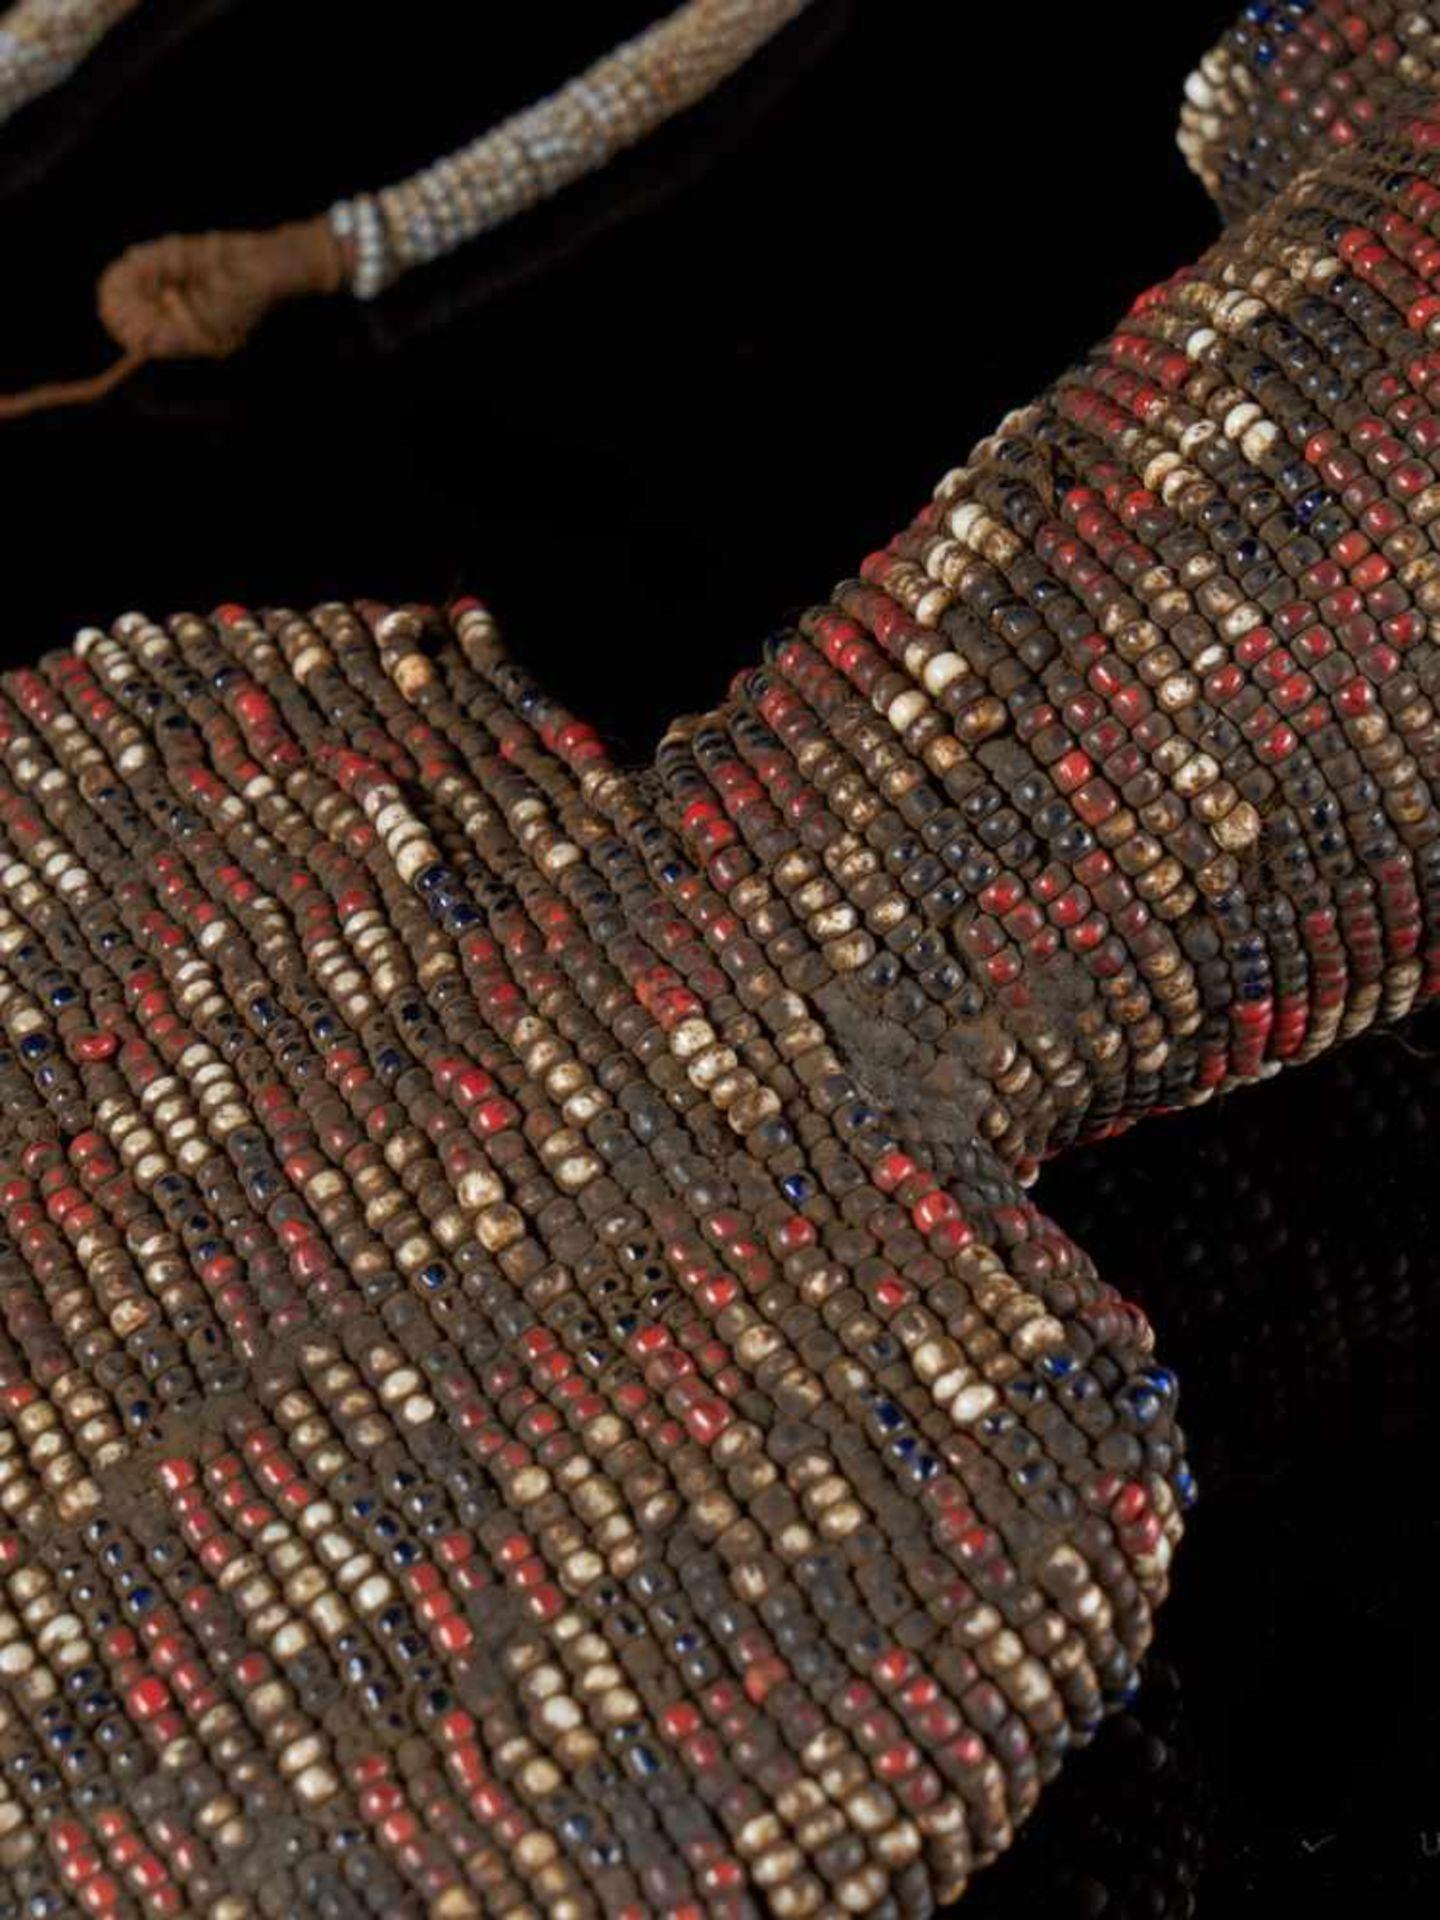 Beaded Ceremonial Flute - Tribal ArtThis intriguing beaded ceremonial flute is covered with a - Bild 4 aus 5